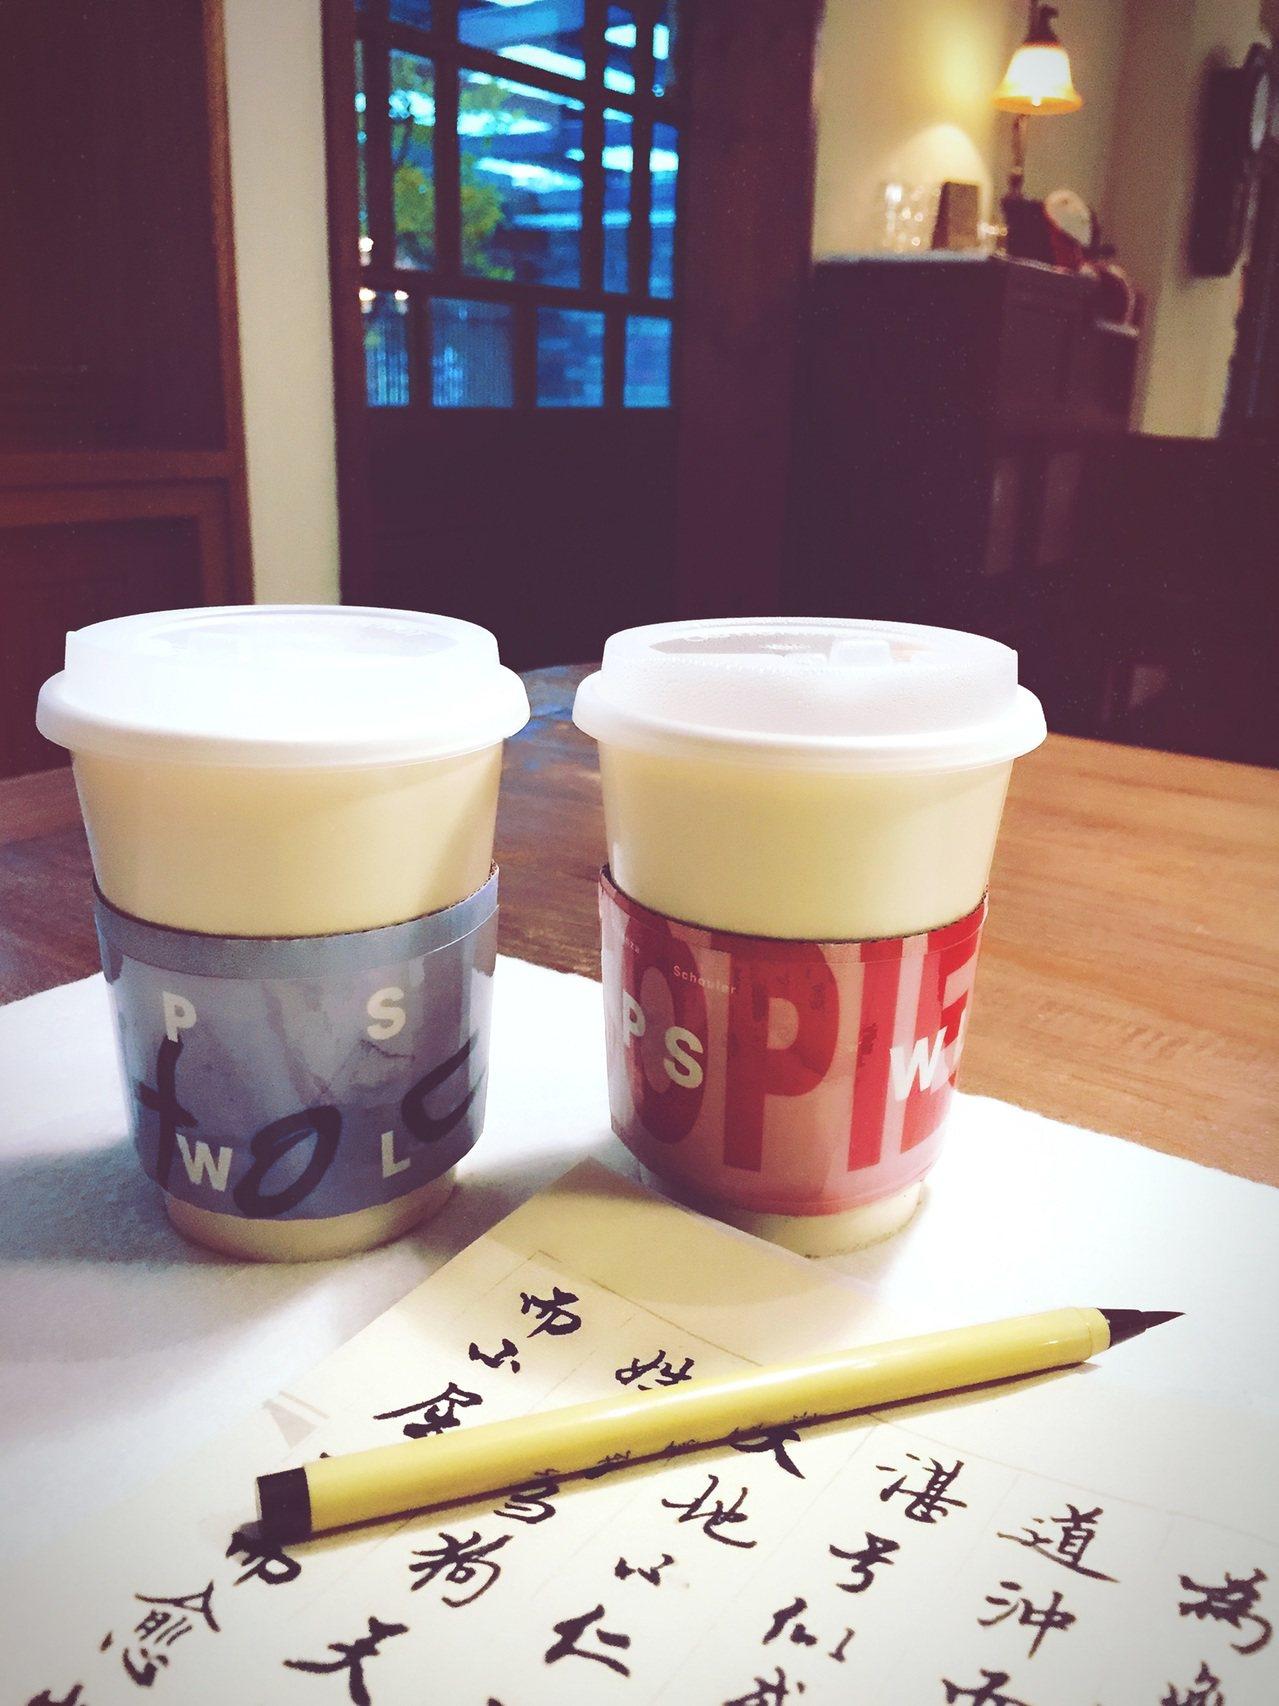 PSWL系列和朵朵開咖啡館推出限量咖啡外帶杯套及紙袋。圖/Proenza Sch...